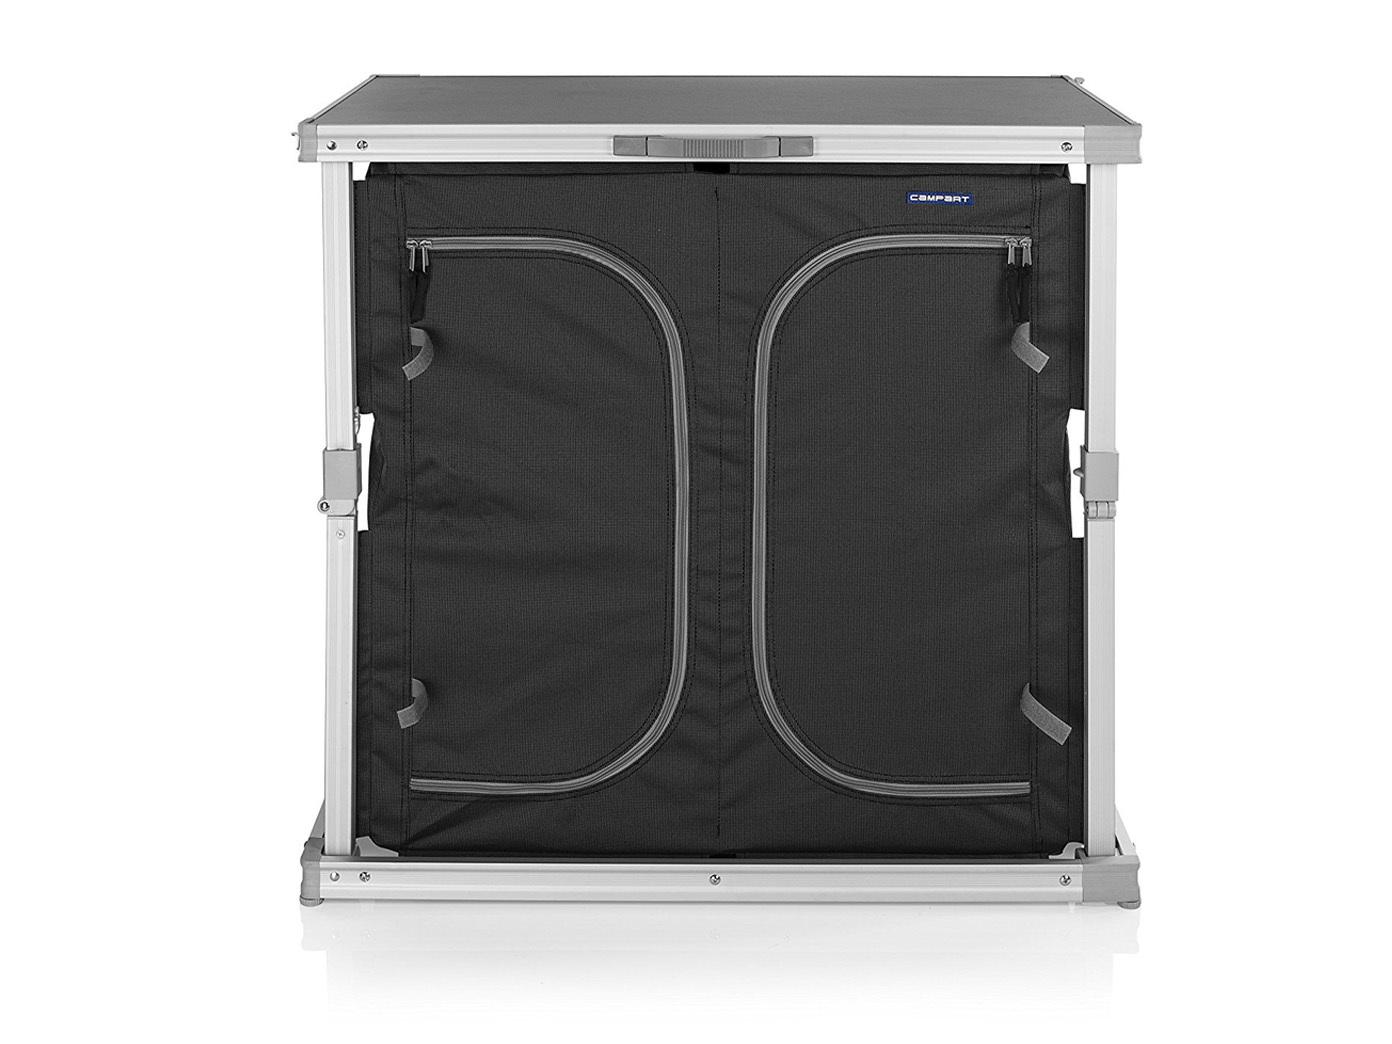 Mobile Outdoor Küche Camping : Stabile mobile campingküche campingmöbel mit klappmechanismus und